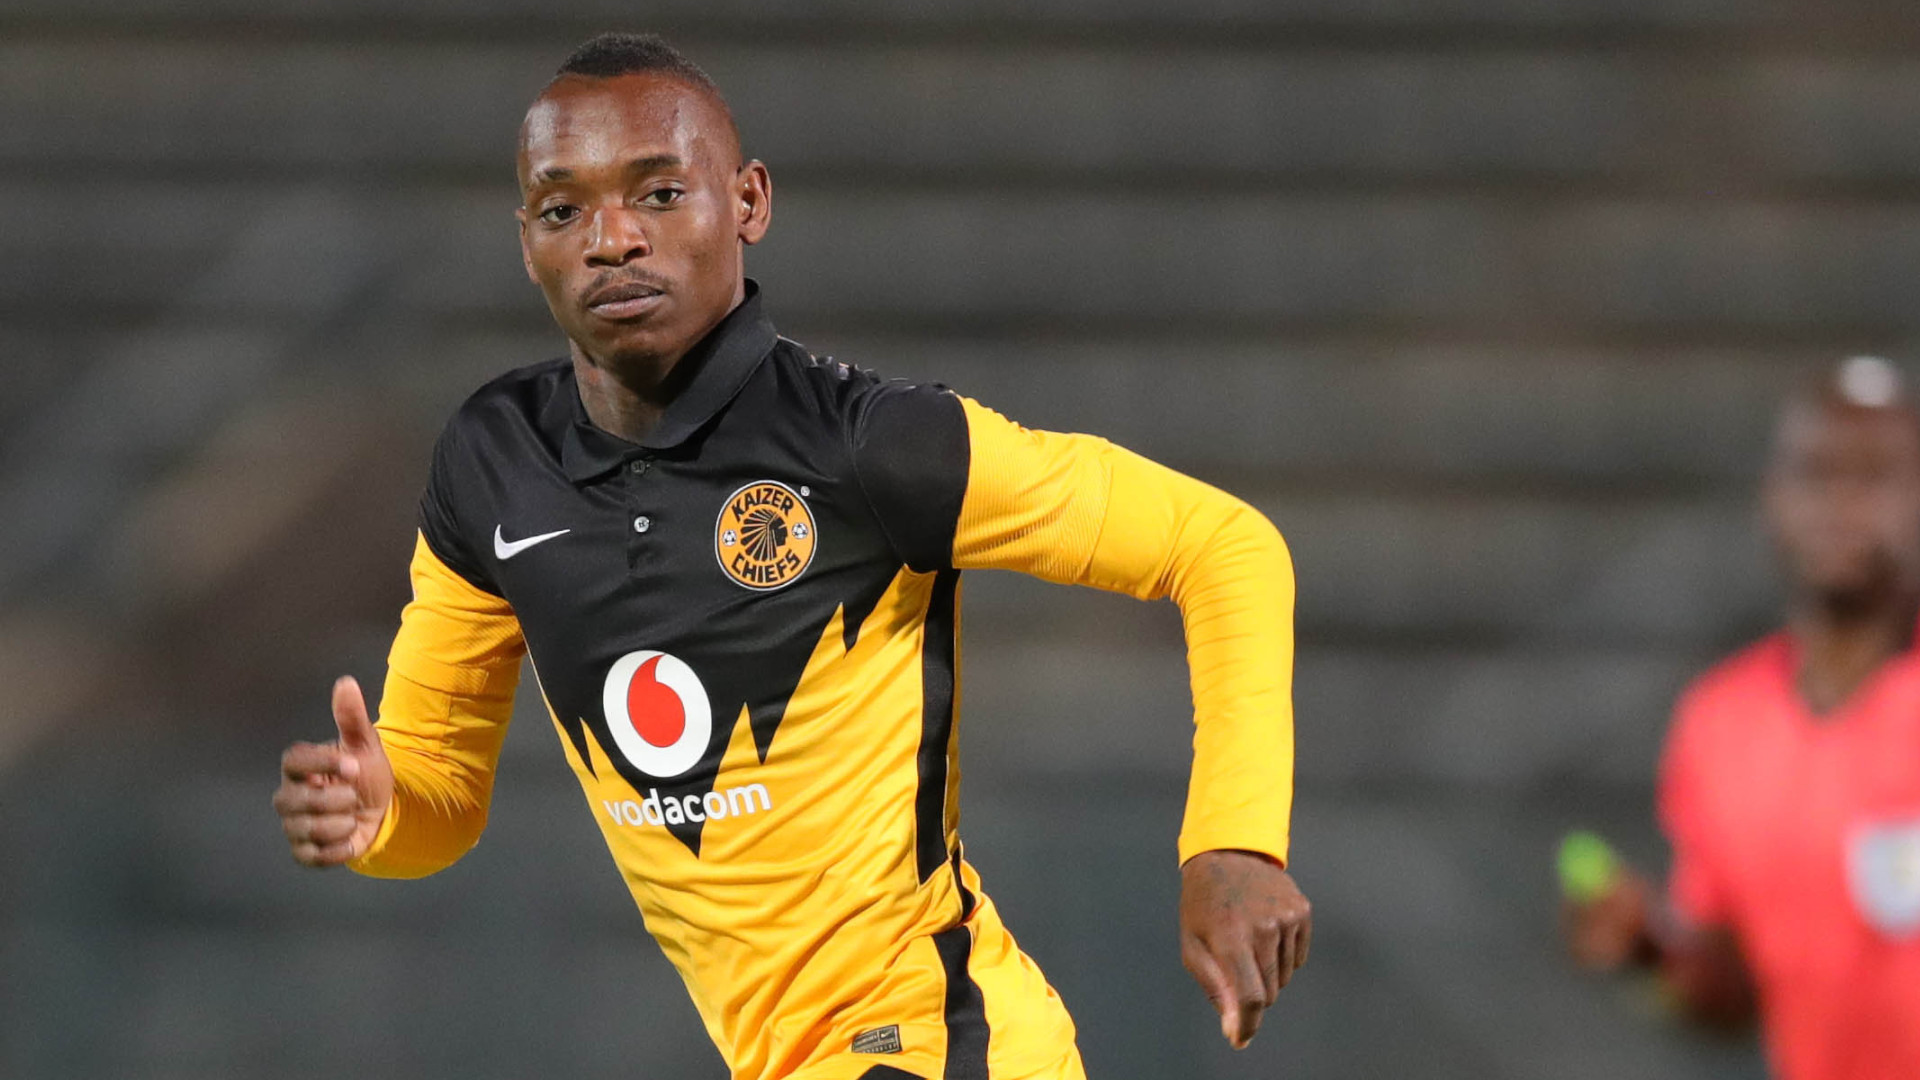 'Yes, I wanted Kaizer Chiefs' Billiat at Mamelodi Sundowns' - Mosimane confesses